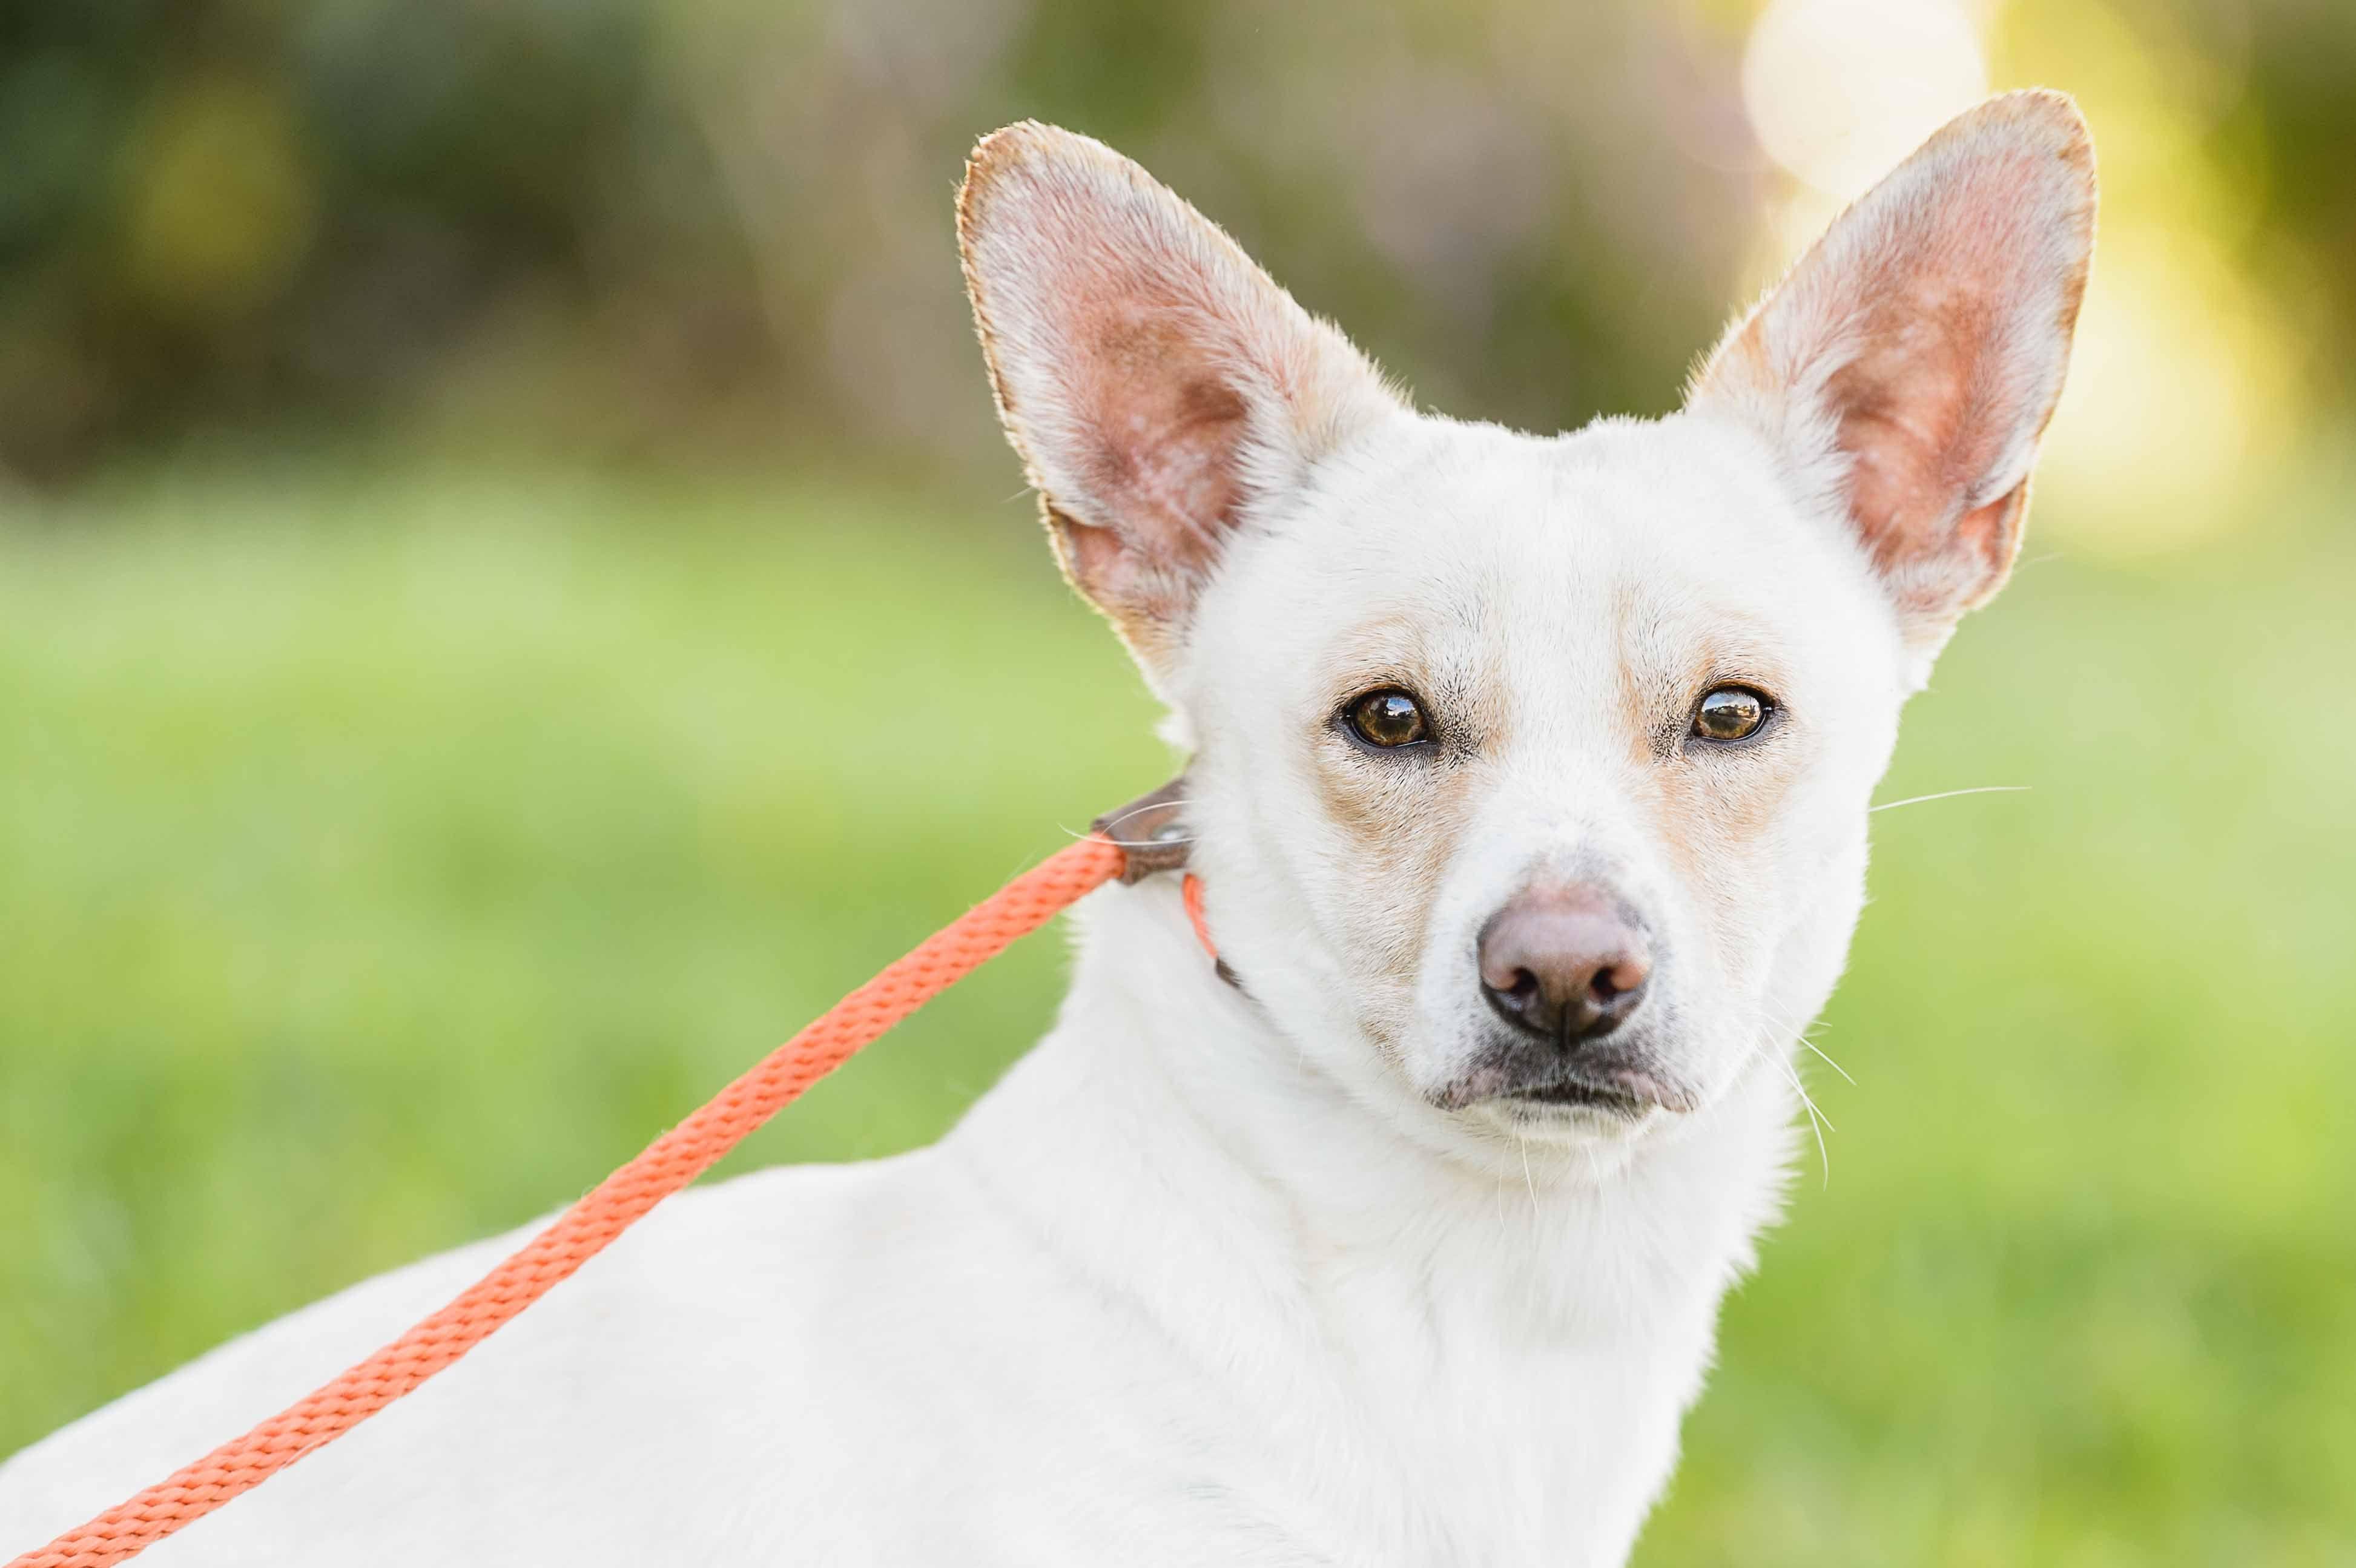 dog for Adoption in El Cajon, CA. ADN781542 on